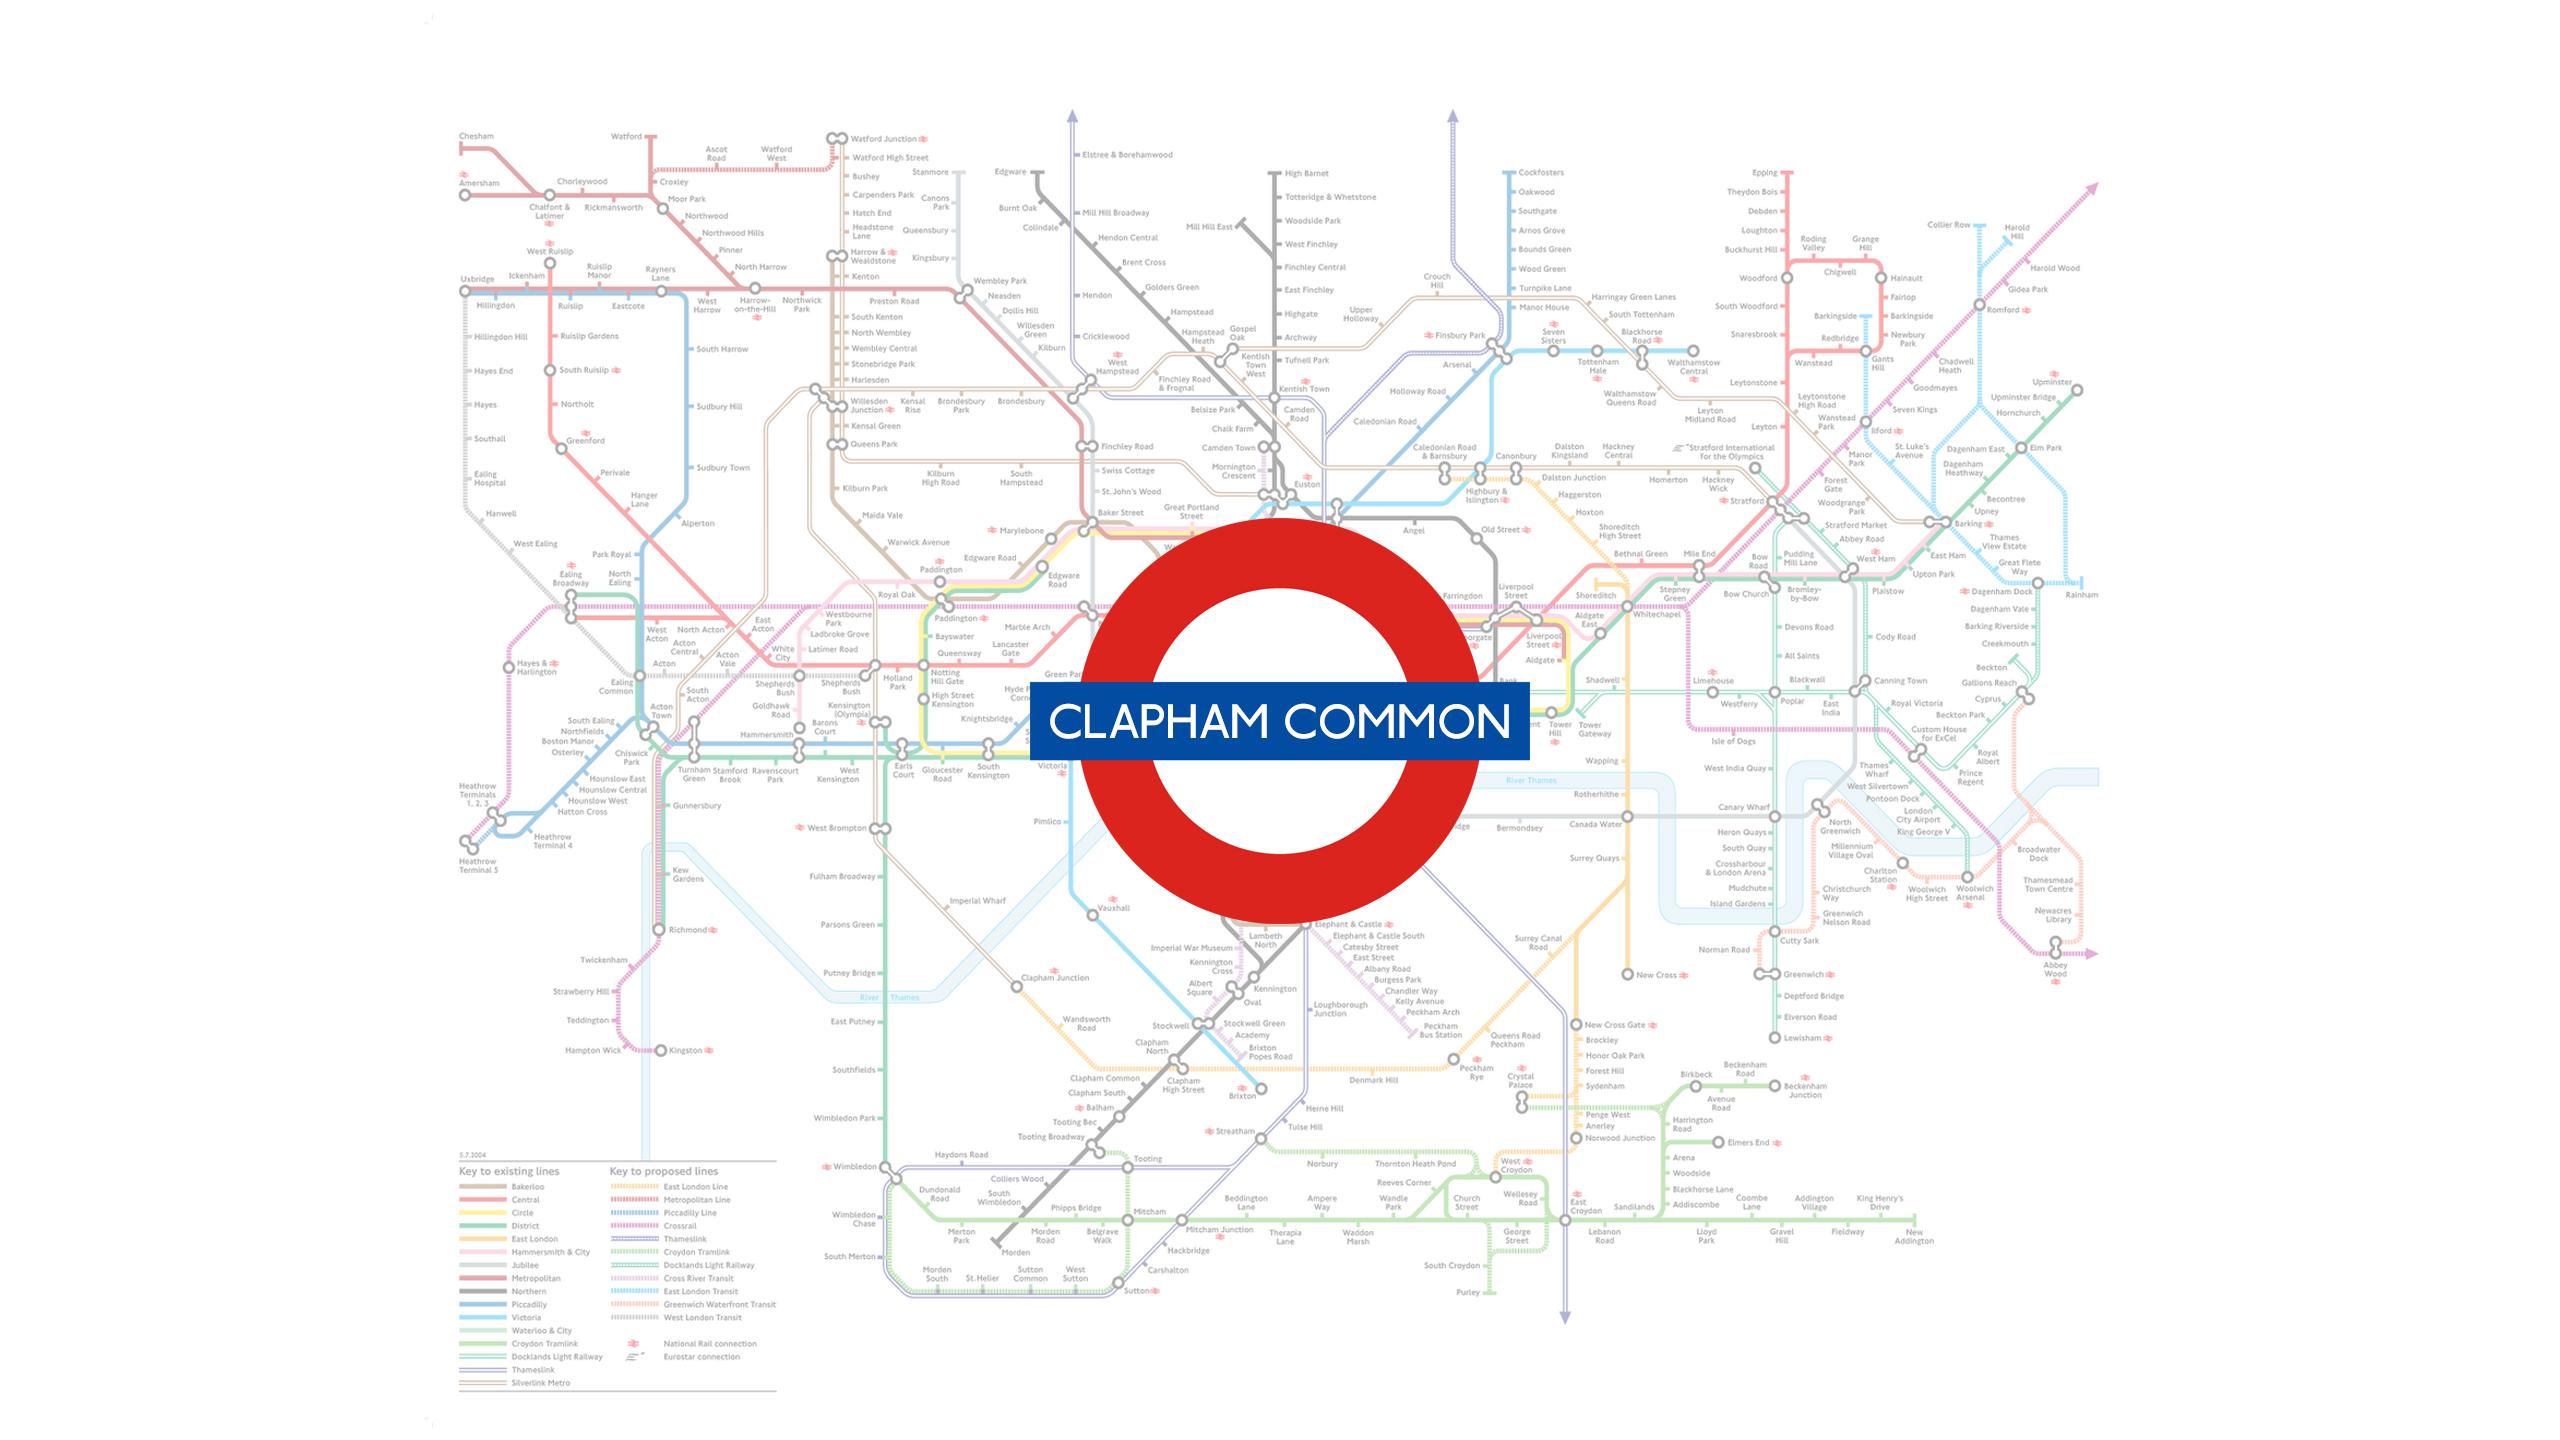 Clapham Common (Map)